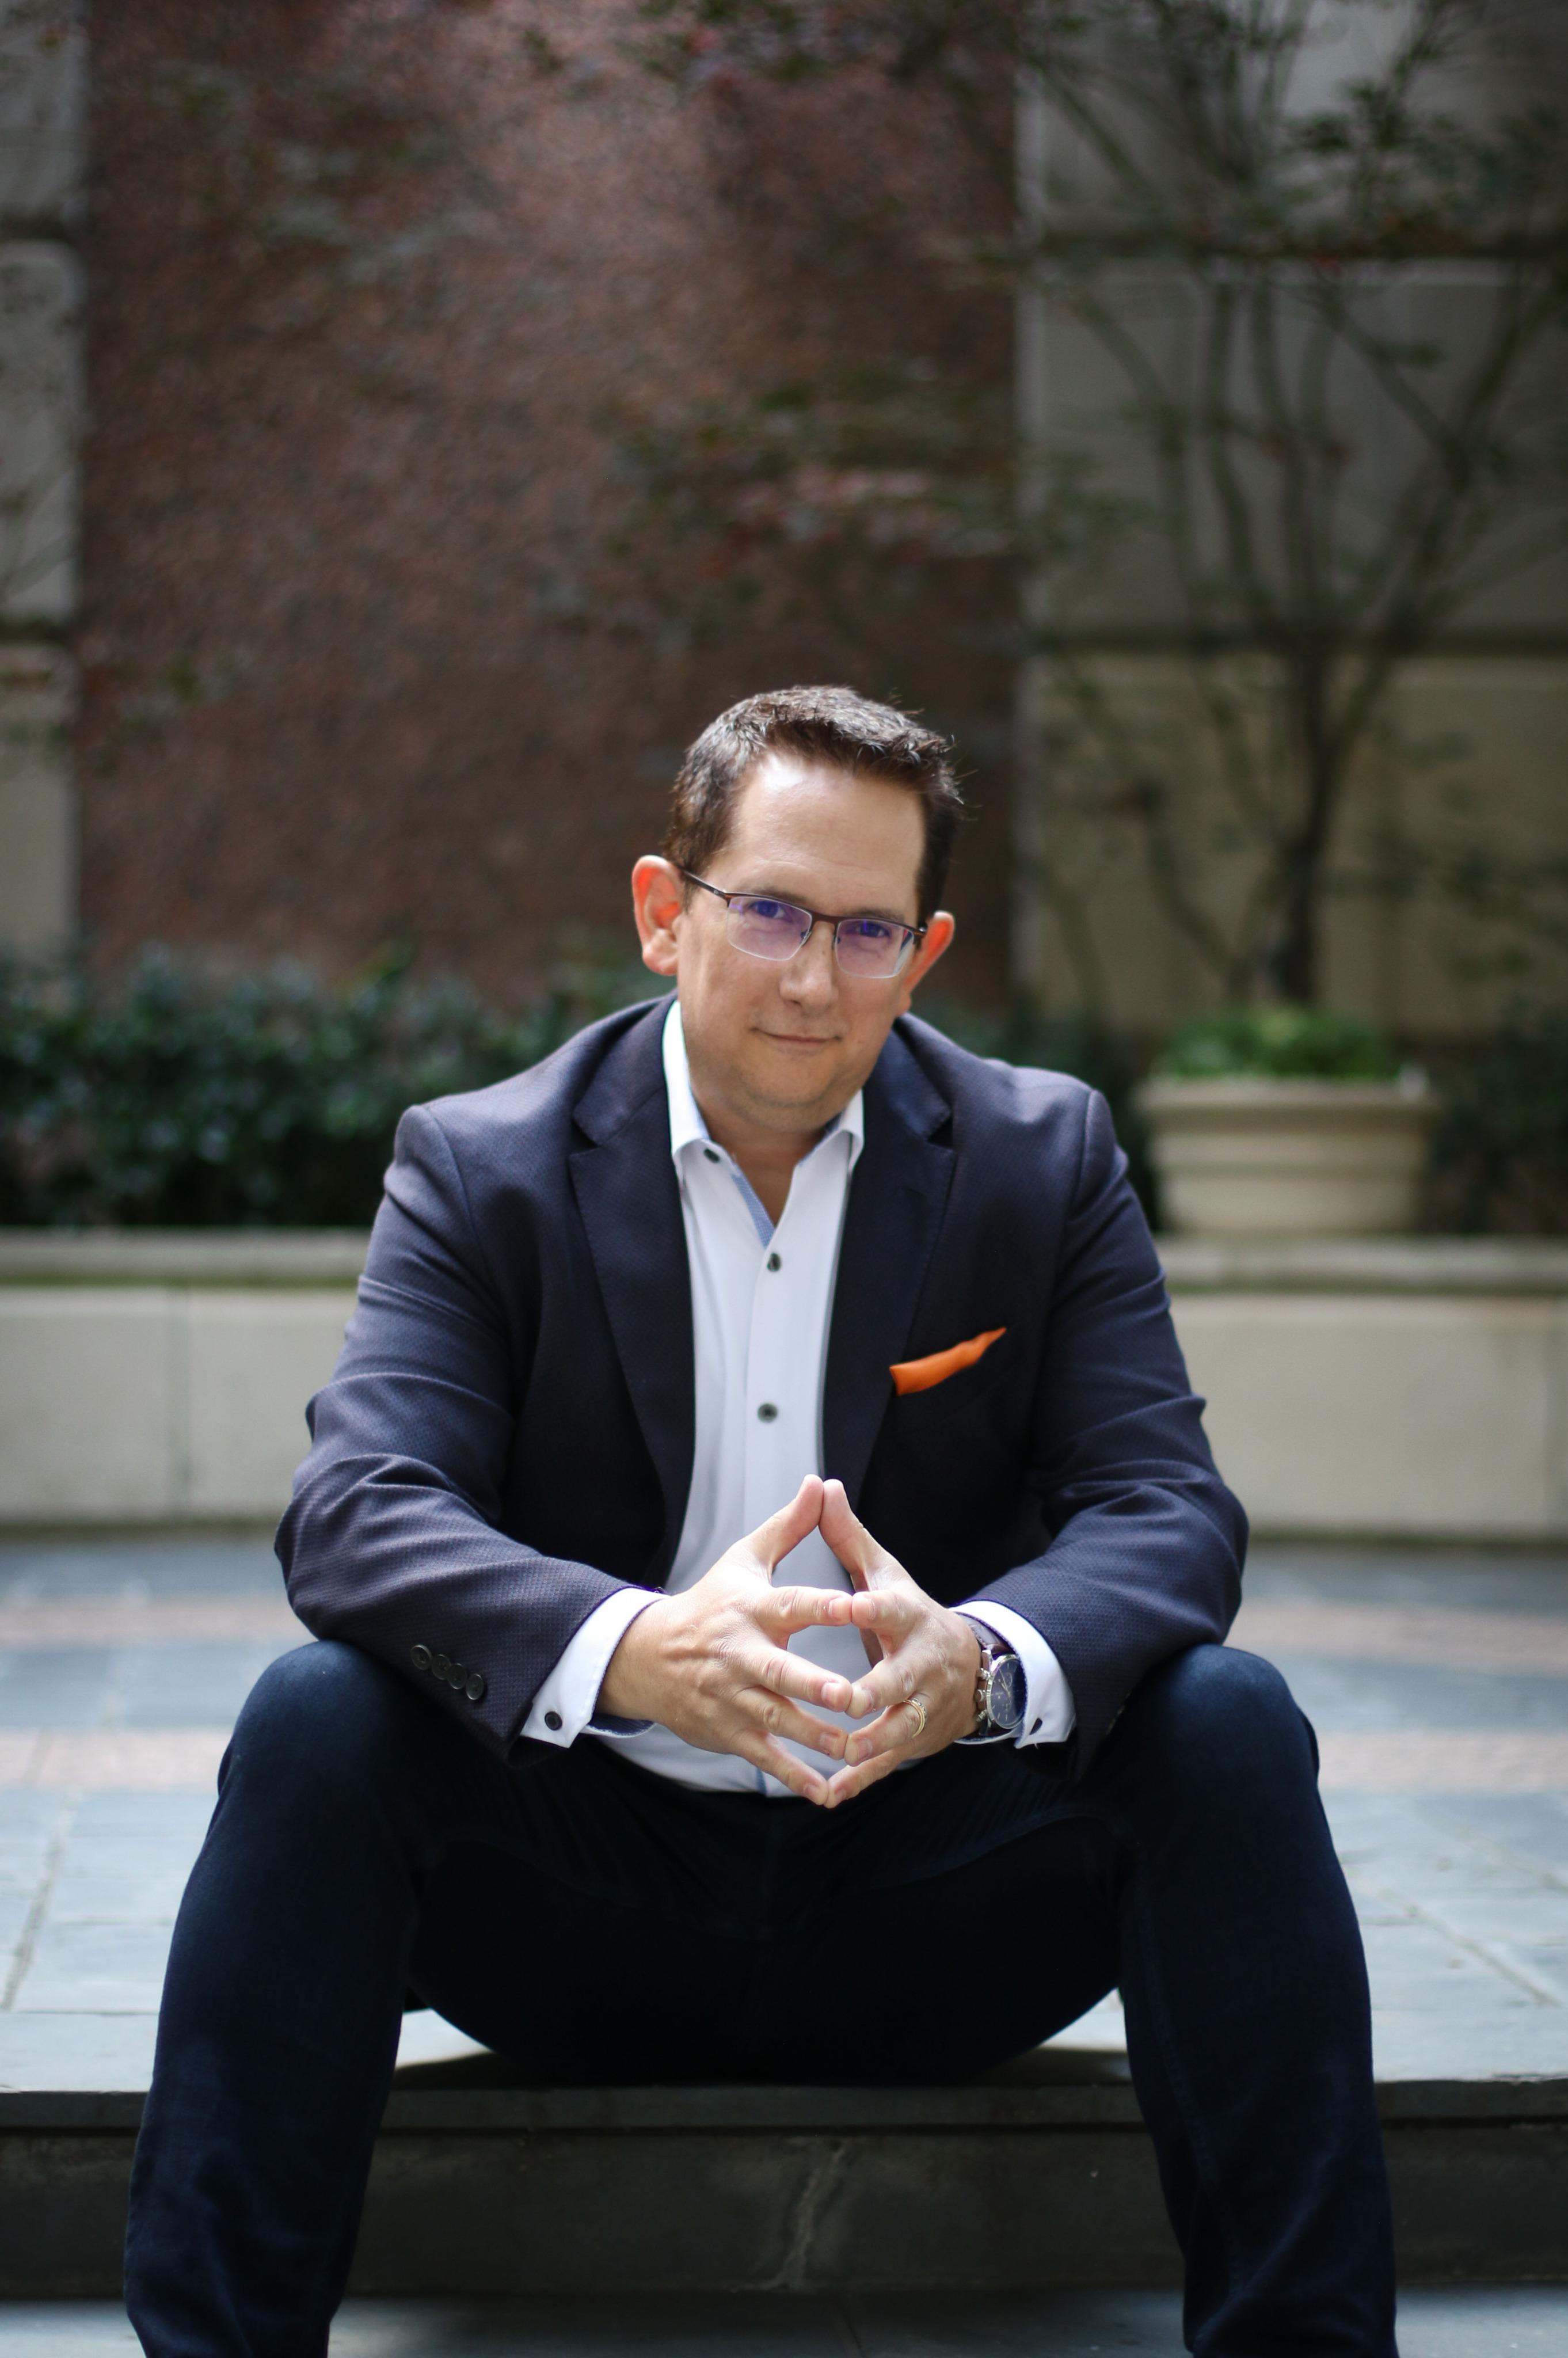 Joe Paranteau, author of Billion Dollar Sales Secrets sitting with his hands tented.